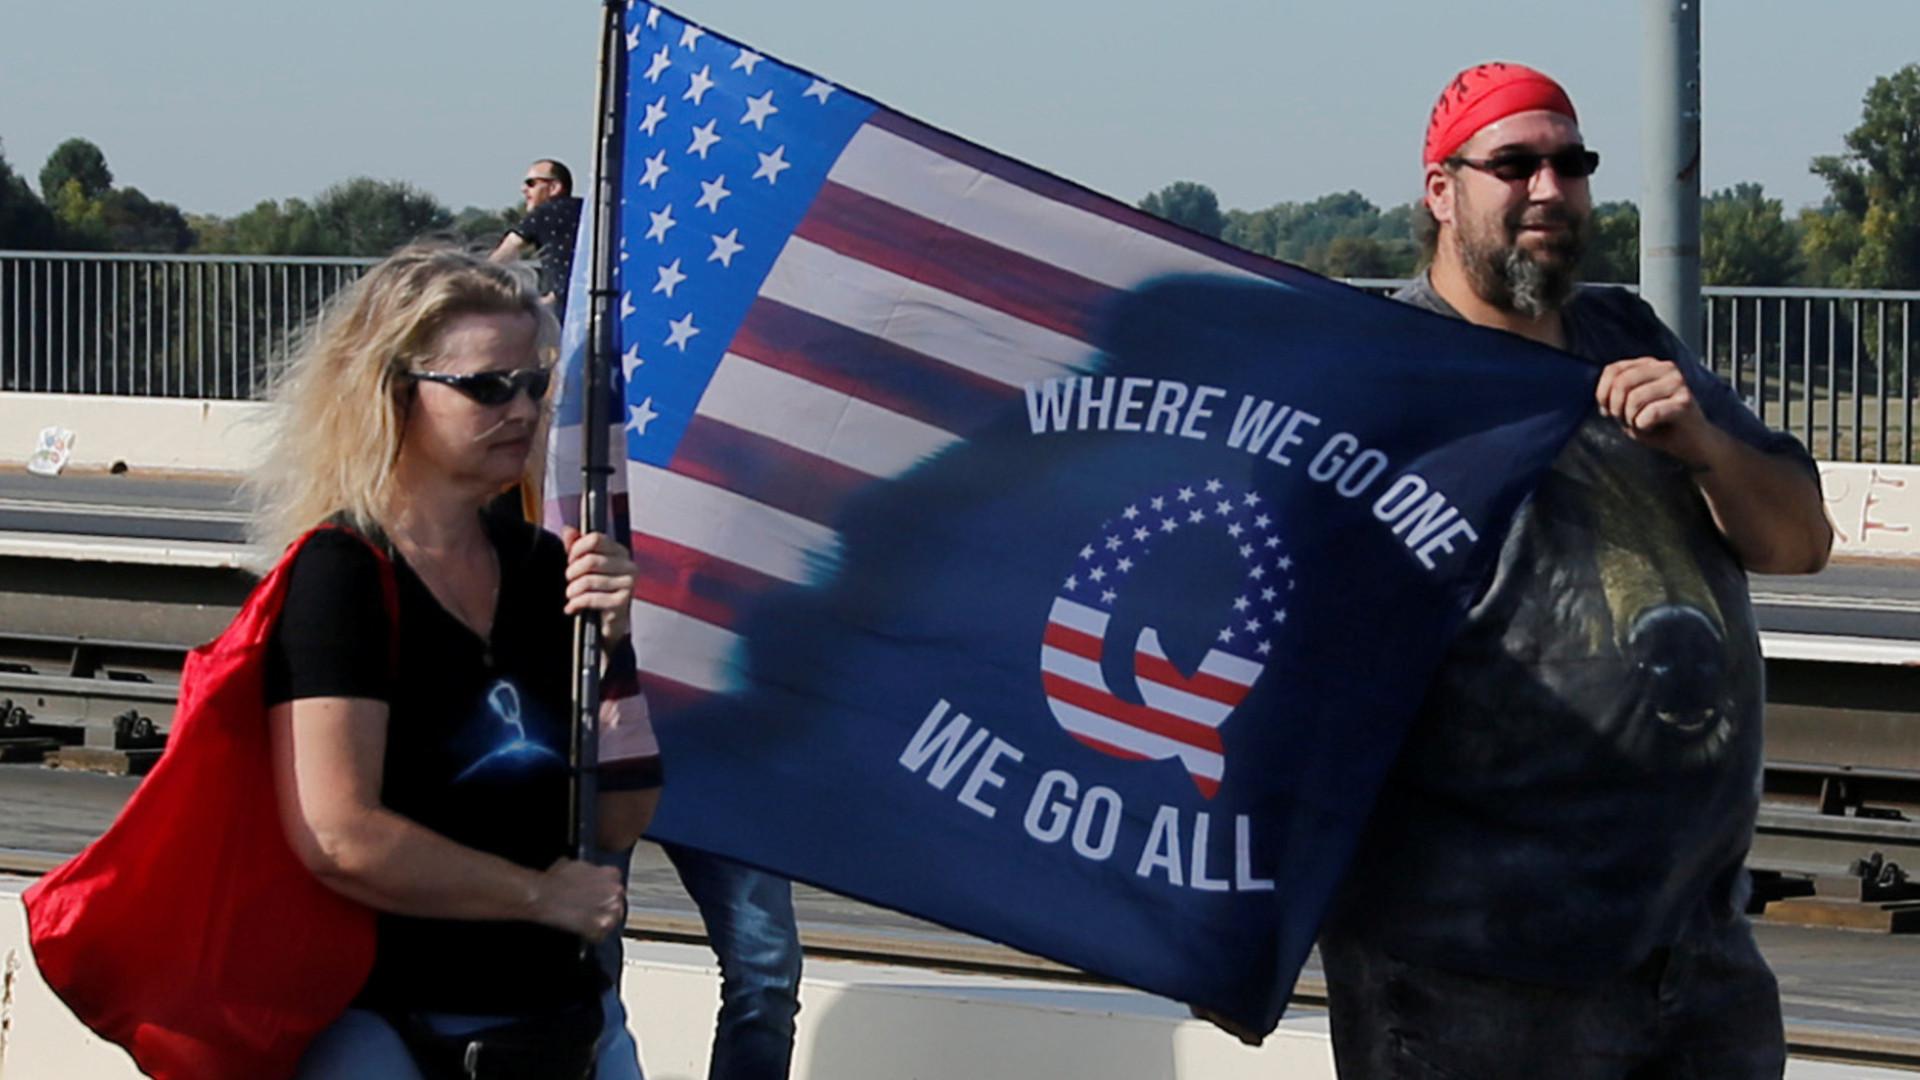 Qアノンの極右陰謀論を信じるアメリカの本気度 コロナ危機で激増、世界に広がる(木村正人) - 個人 - Yahoo!ニュース